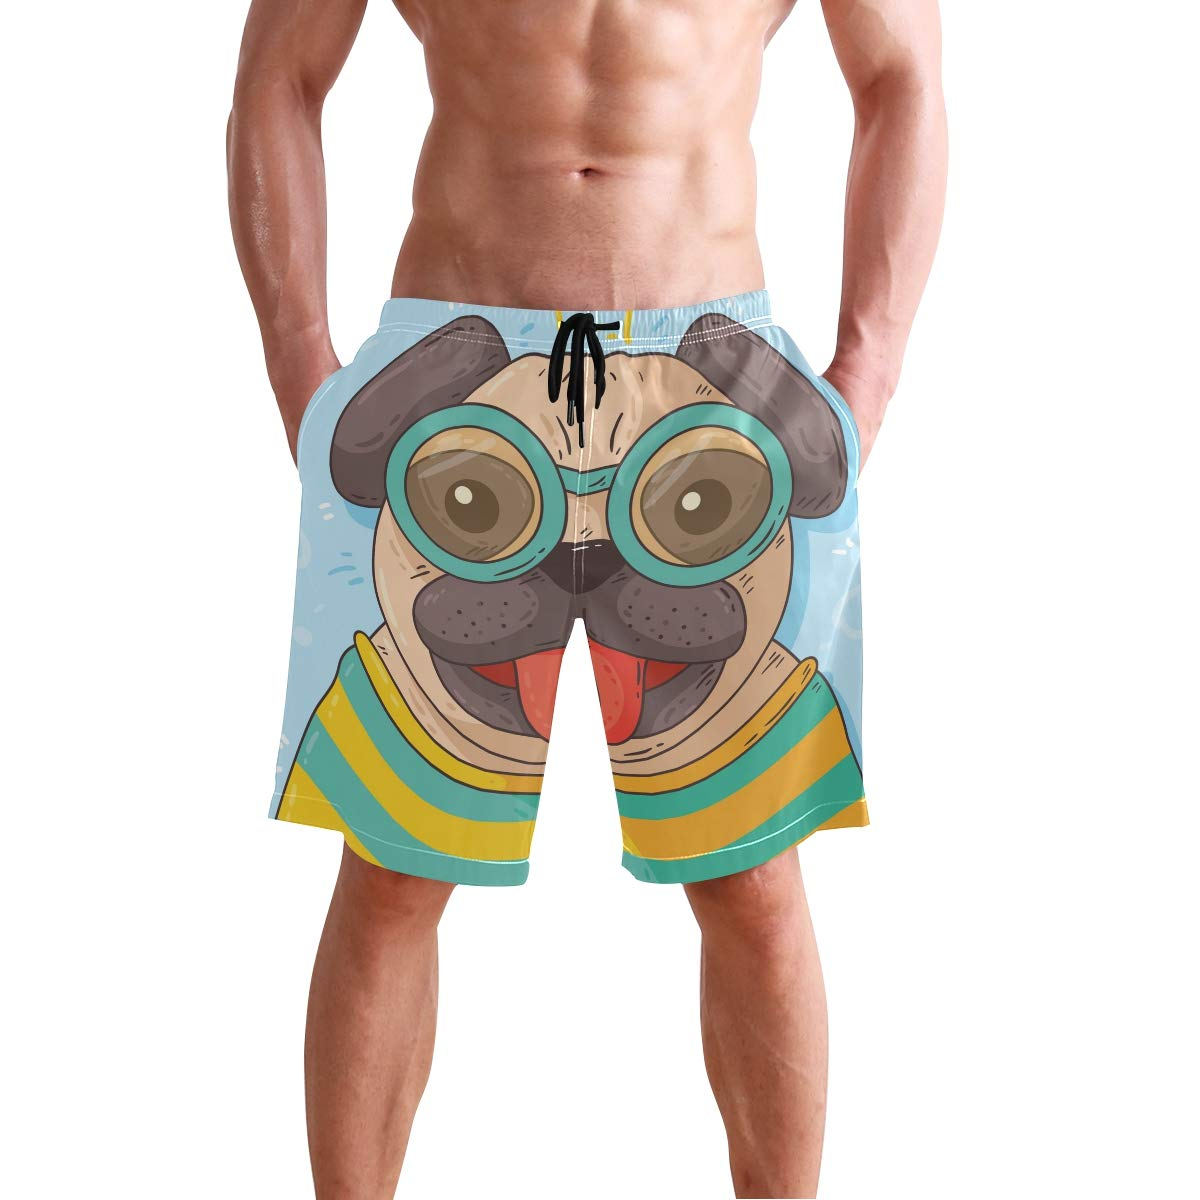 Men/'s Swim Trunks Beach Board Swimwear Shorts Stripe Dog Swimming Short Pants Quick Dry Water Shorts Mesh Lining